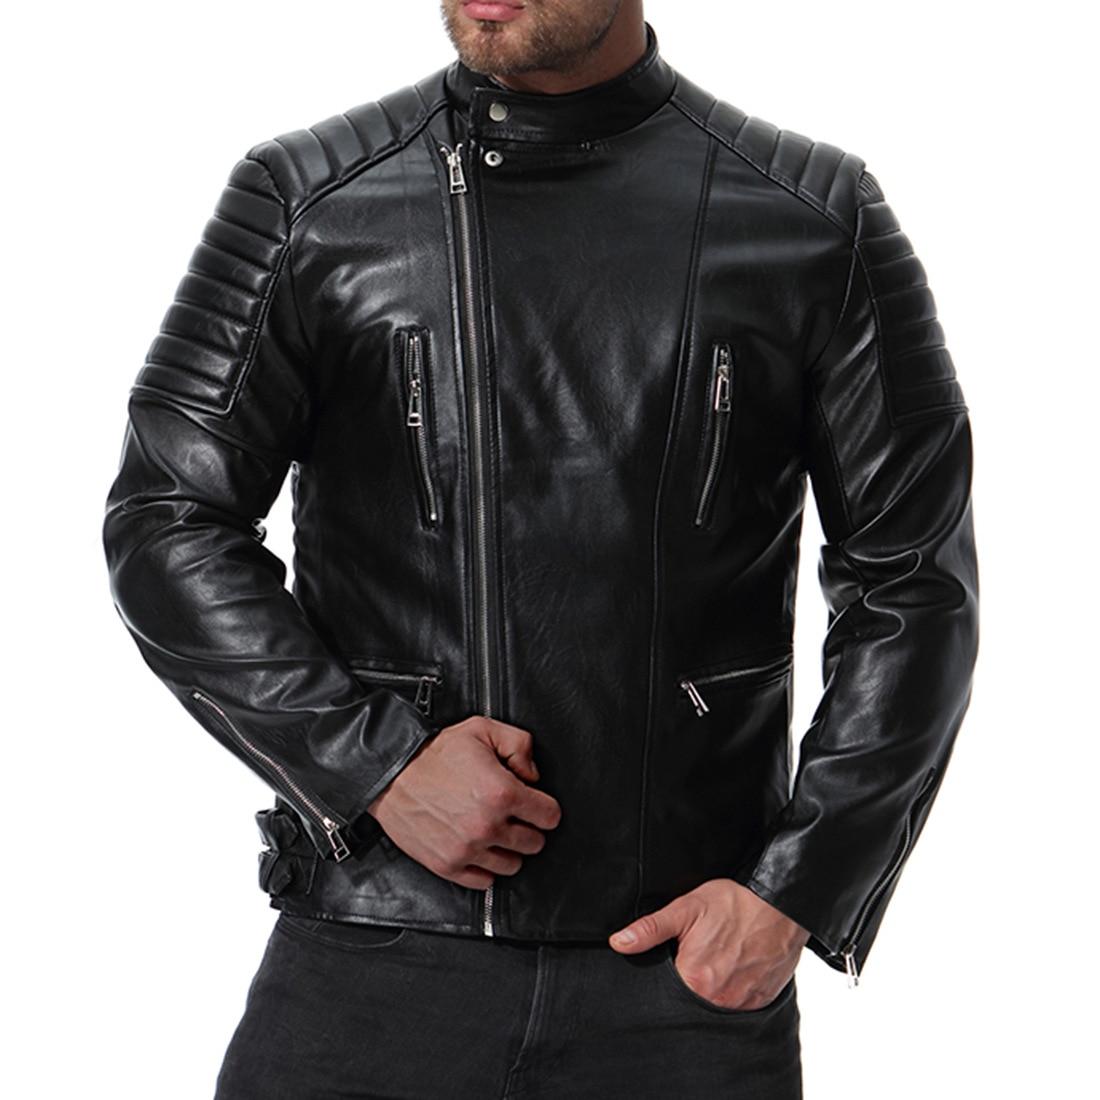 MarKyi 2018 moda outono gola pu jaqueta de couro da motocicleta dos homens plus size 5xl jaqueta de couro motoqueiro